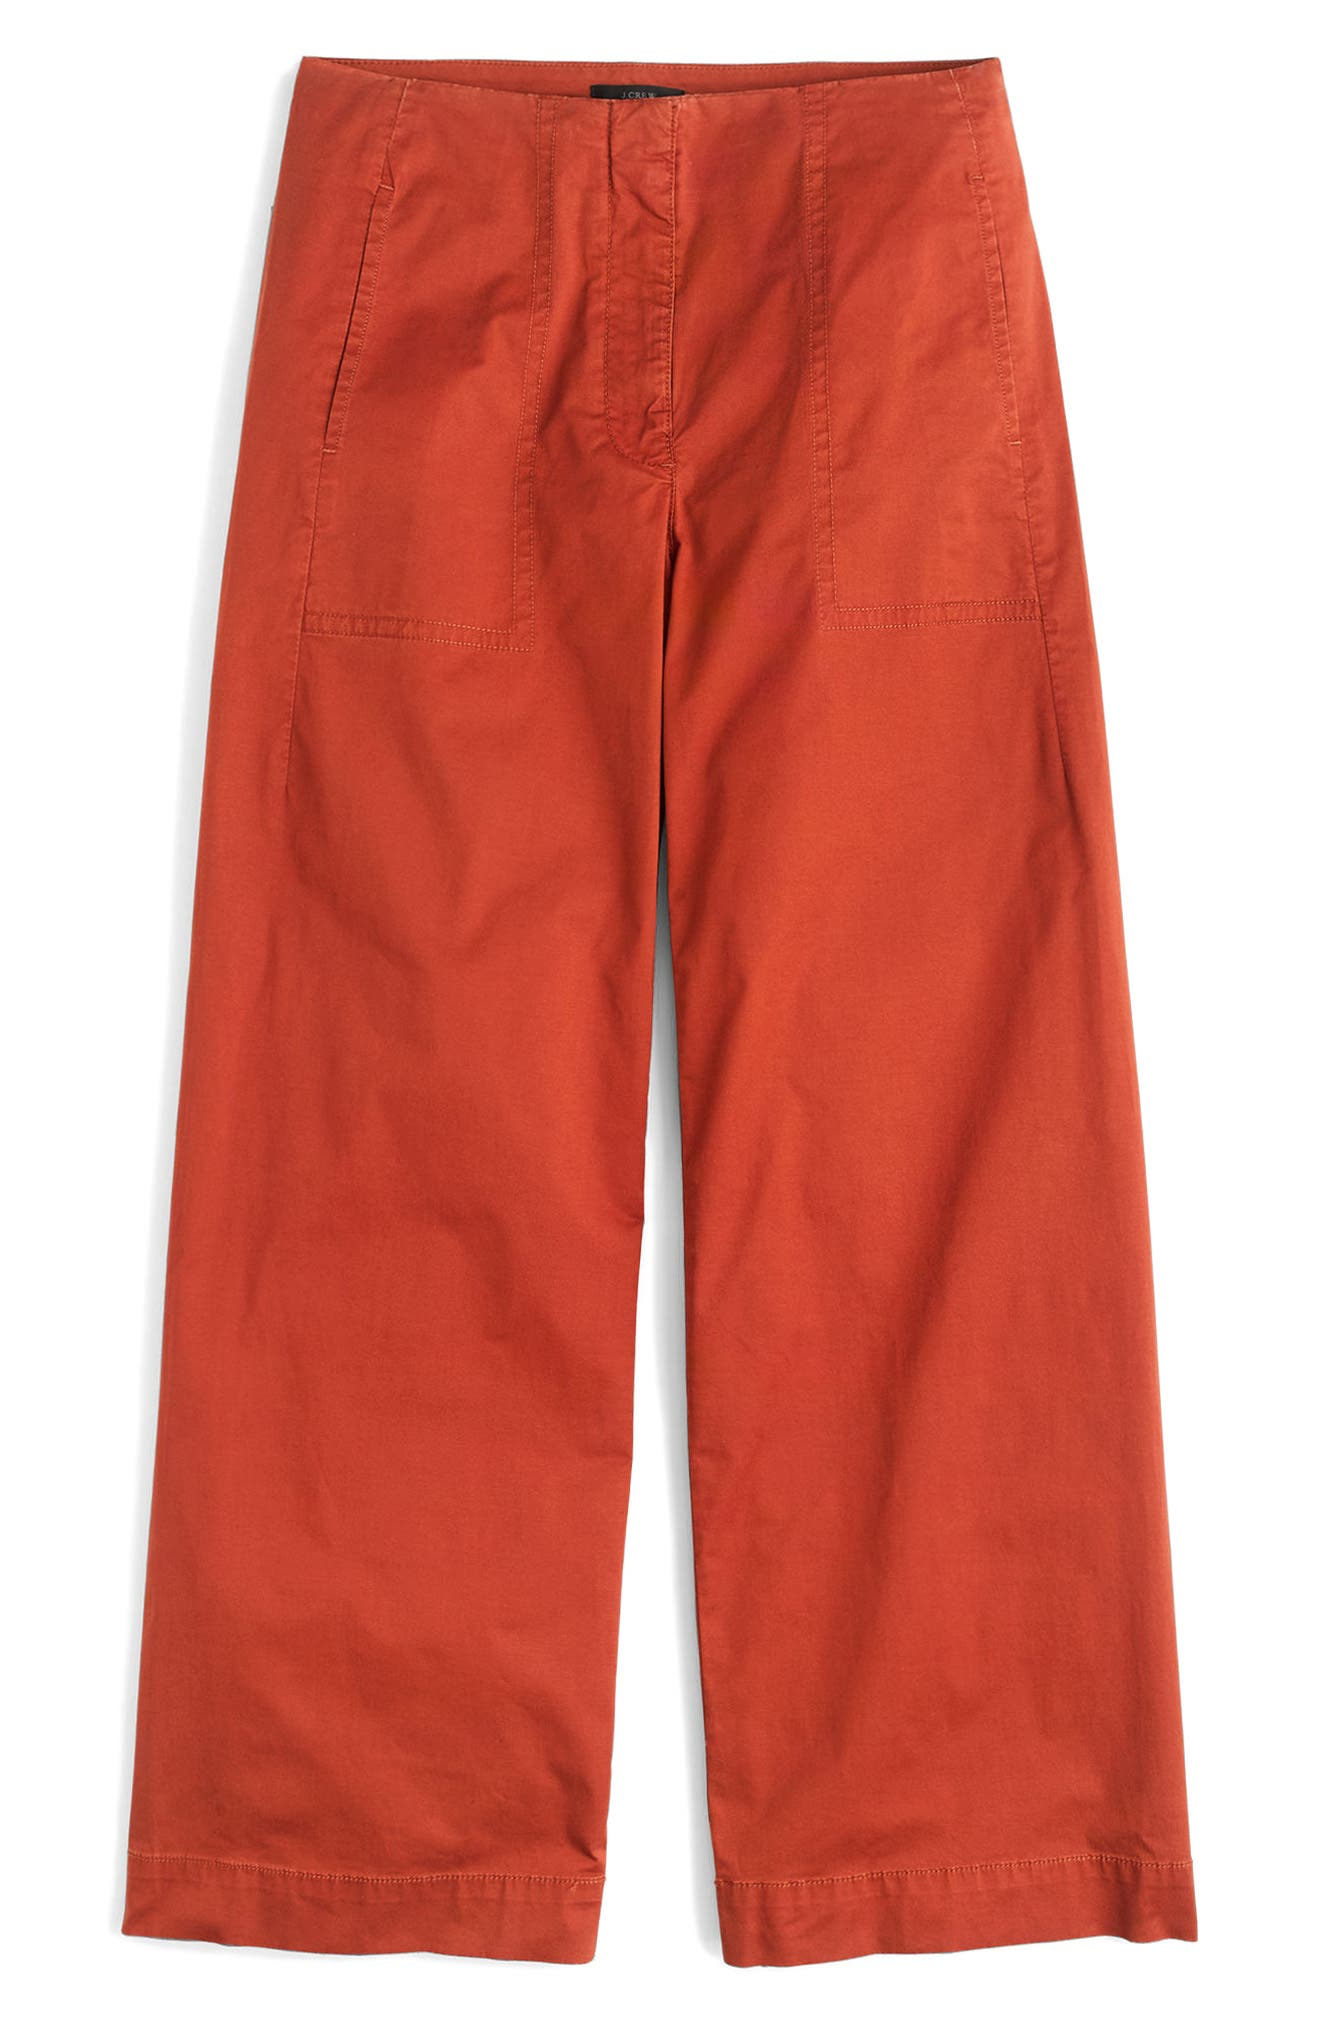 J.Crew Crop Stretch Chino Pants